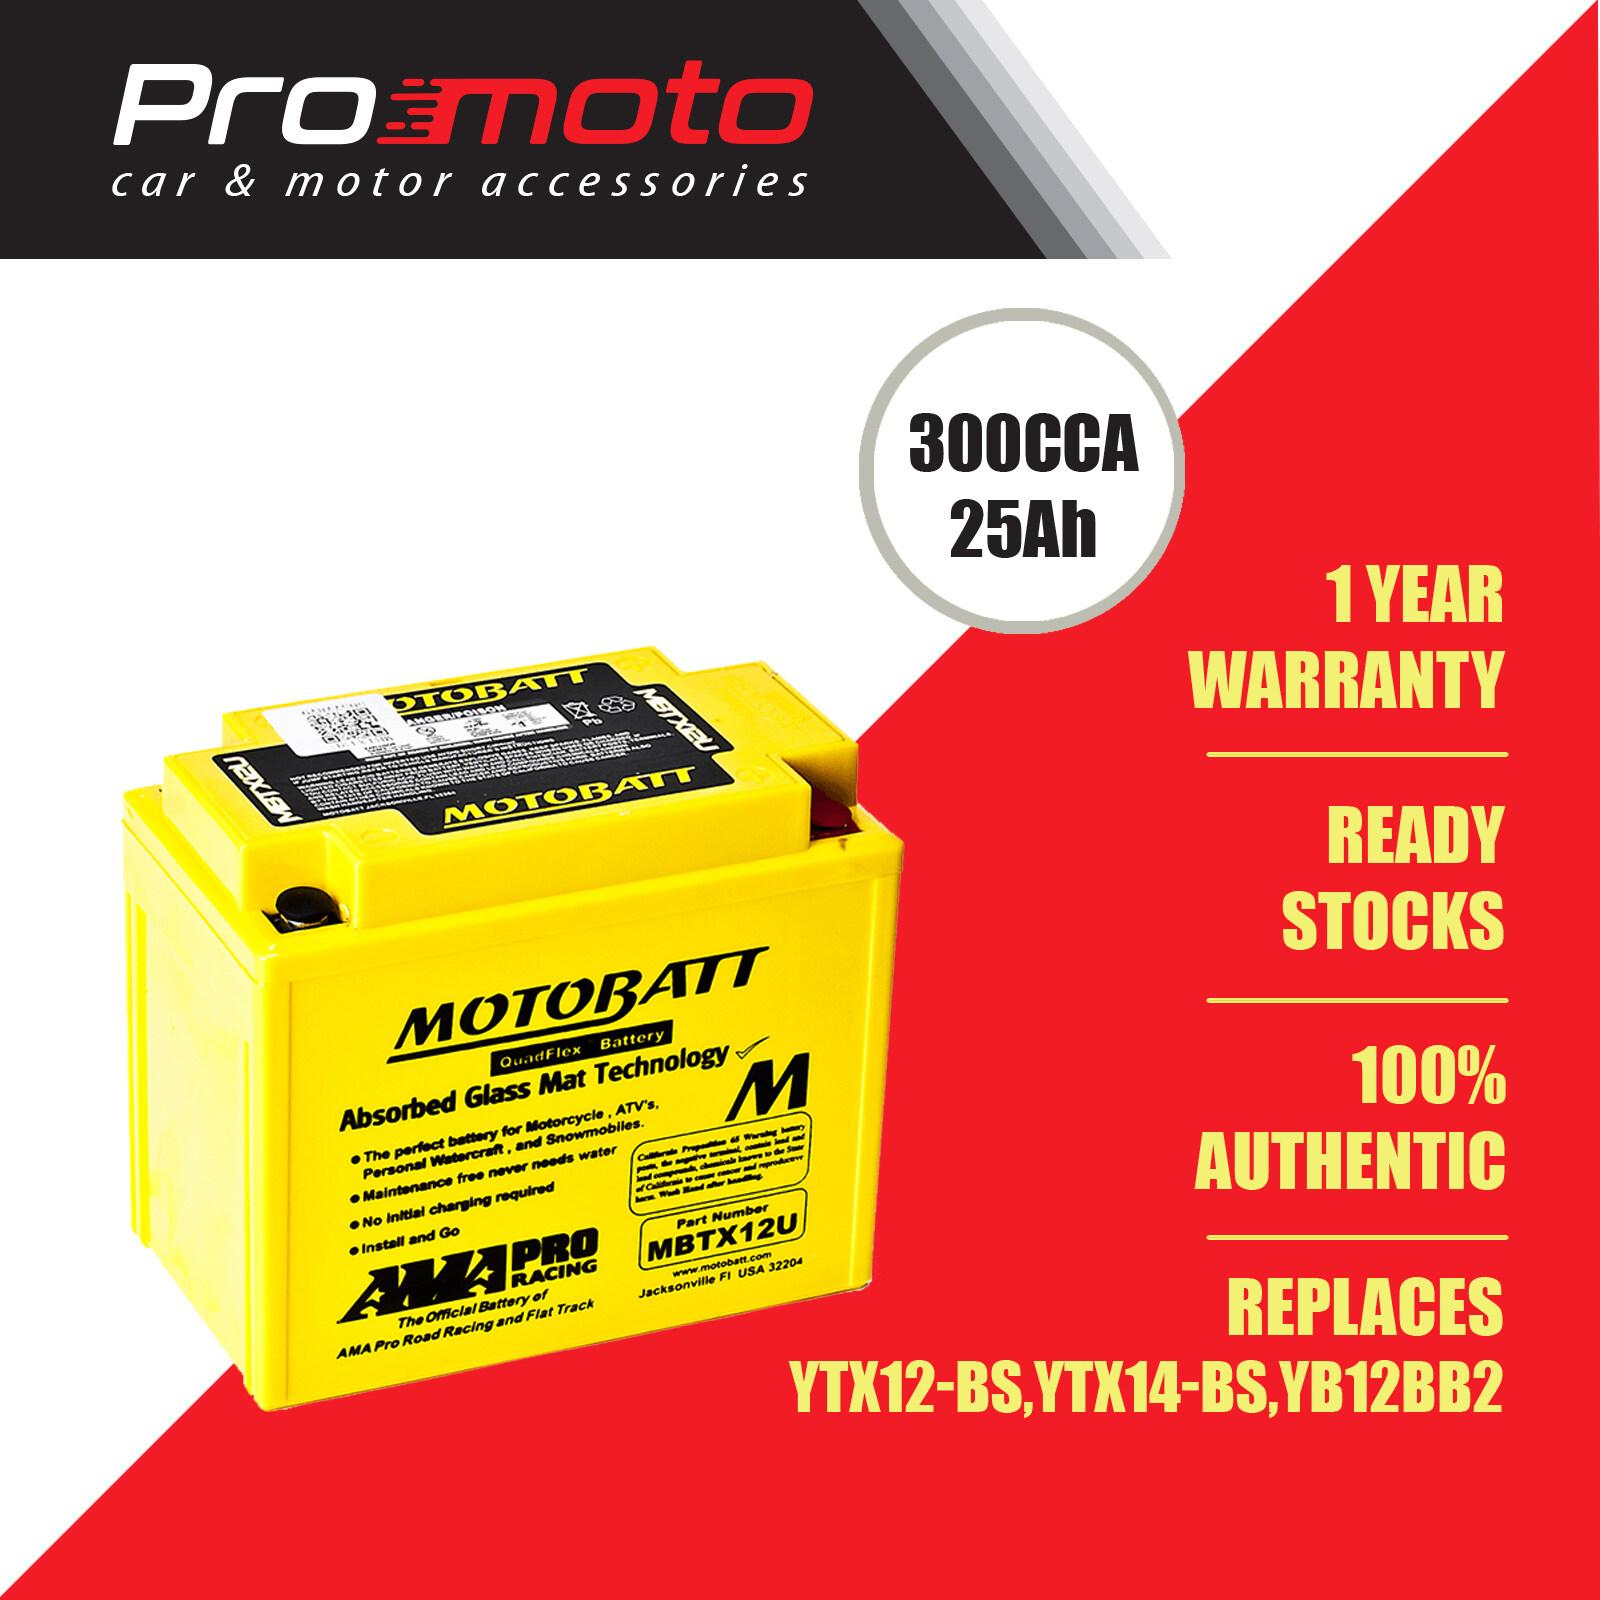 Motobatt Quadflex Battery MBTX12U (FOR HONDA, KAWASAKI, HARLEY-DAVIDSON & etc) (Replaces YTX12-BS, YTX14-BS,YB12BB2)